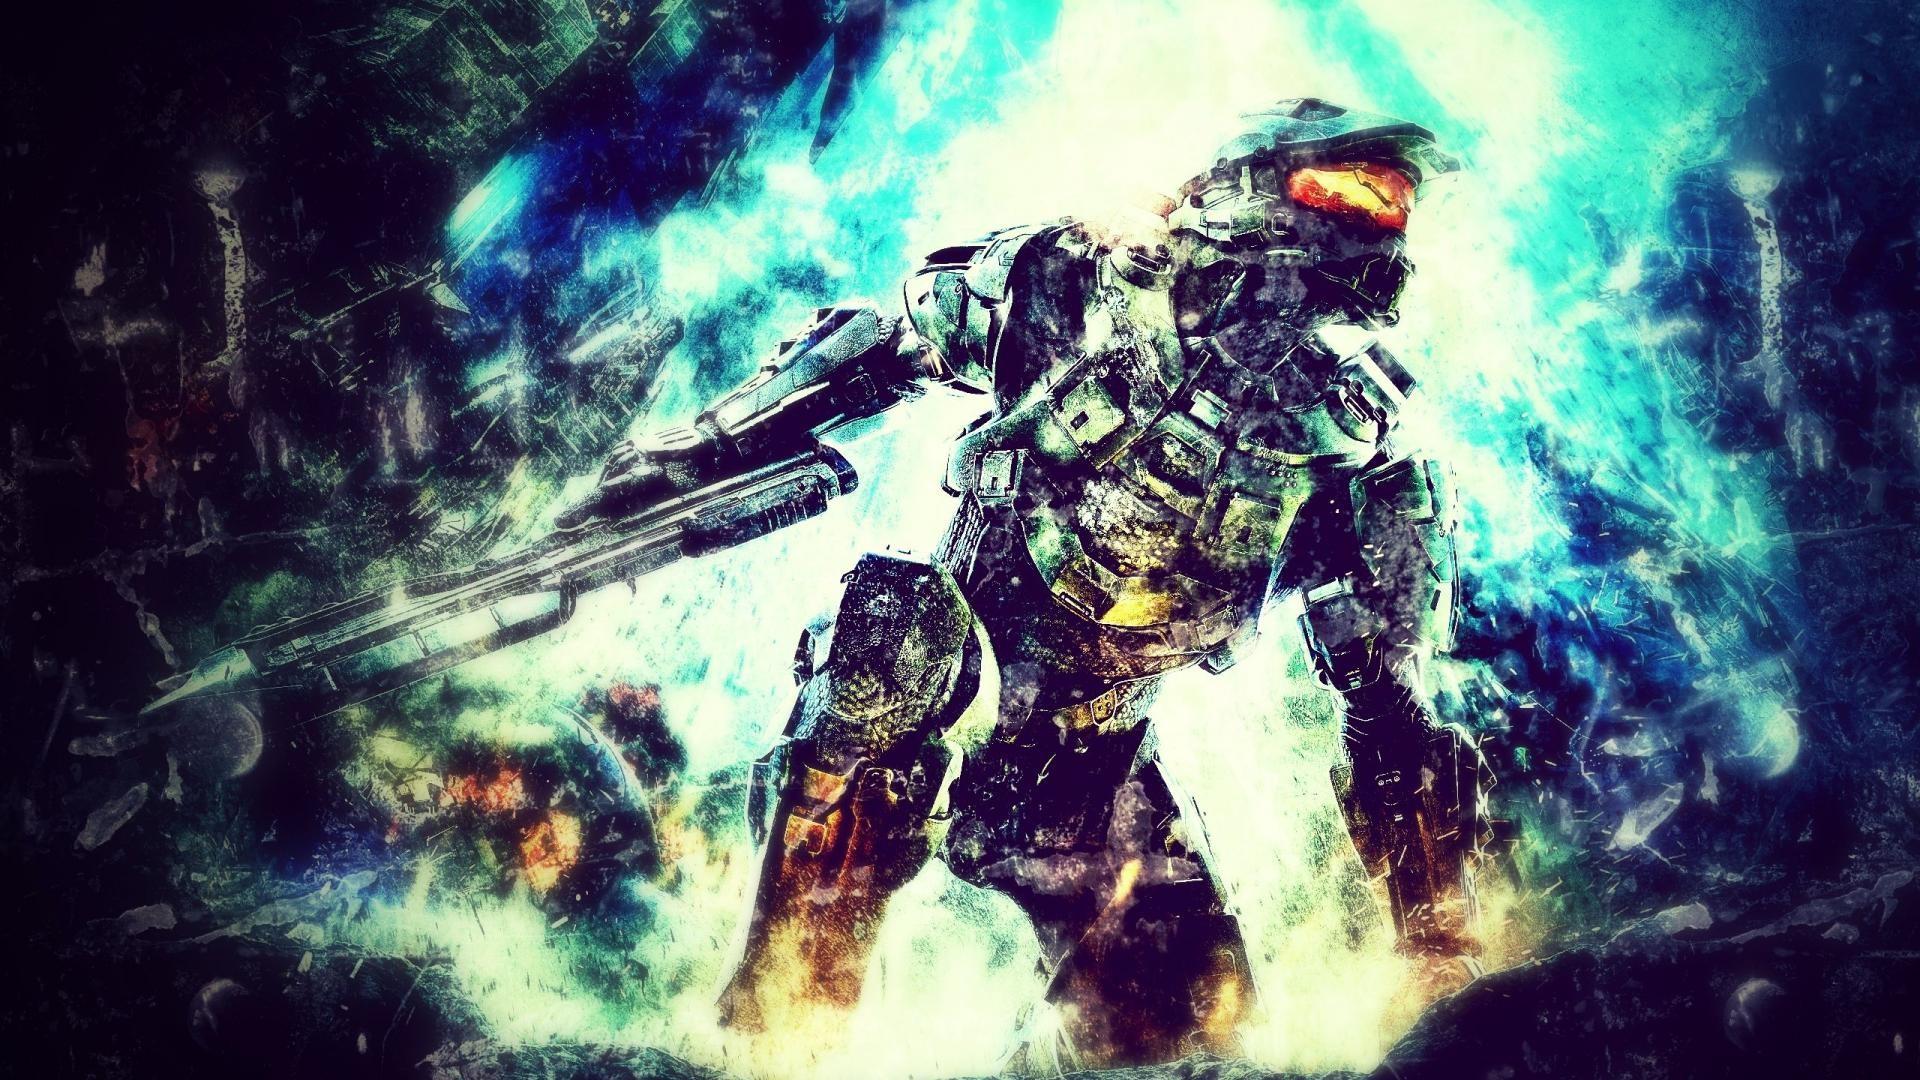 Wallpaper Video Games Master Chief Halo 4 Screenshot